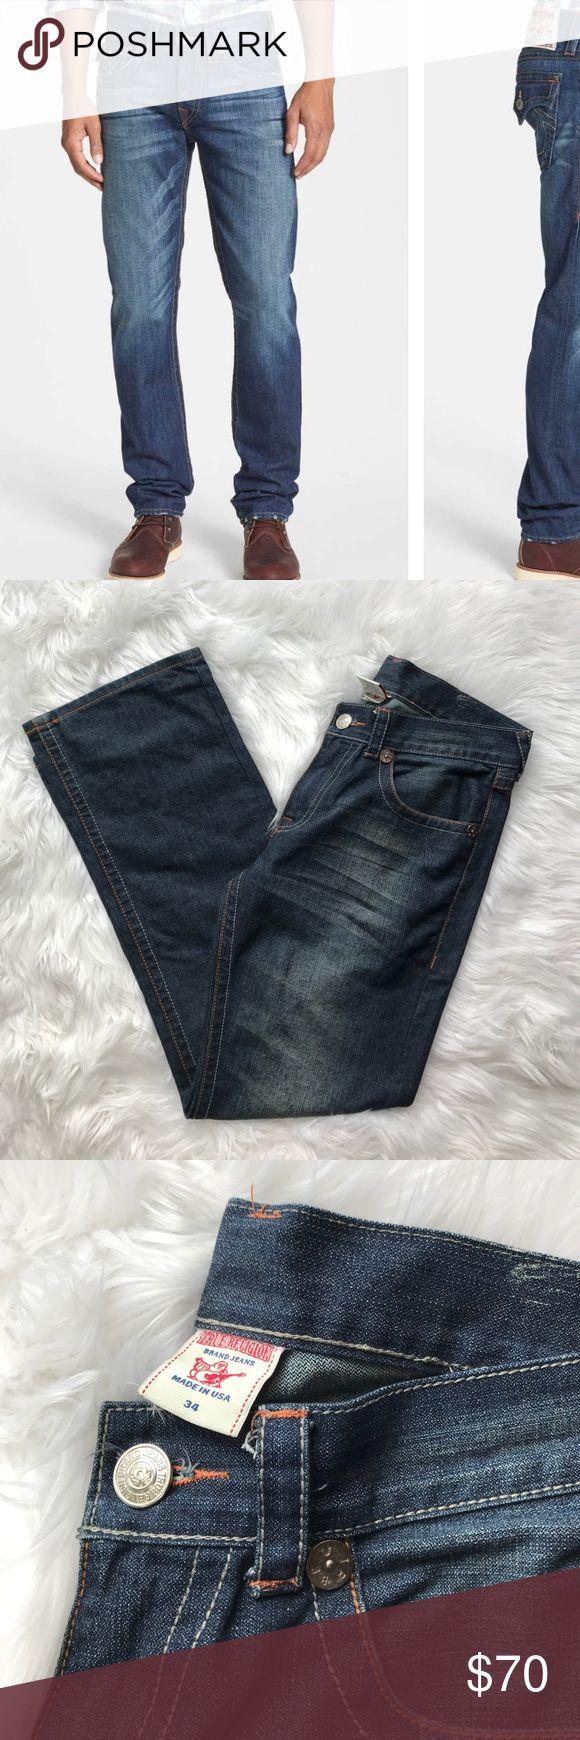 "• True Religion • Zach Men's Jeans Size 34 - True Religion - Men's - Zach Jeans - Size 34 - Inseam 34""  - New without Tags True Religion Jeans Slim Straight"